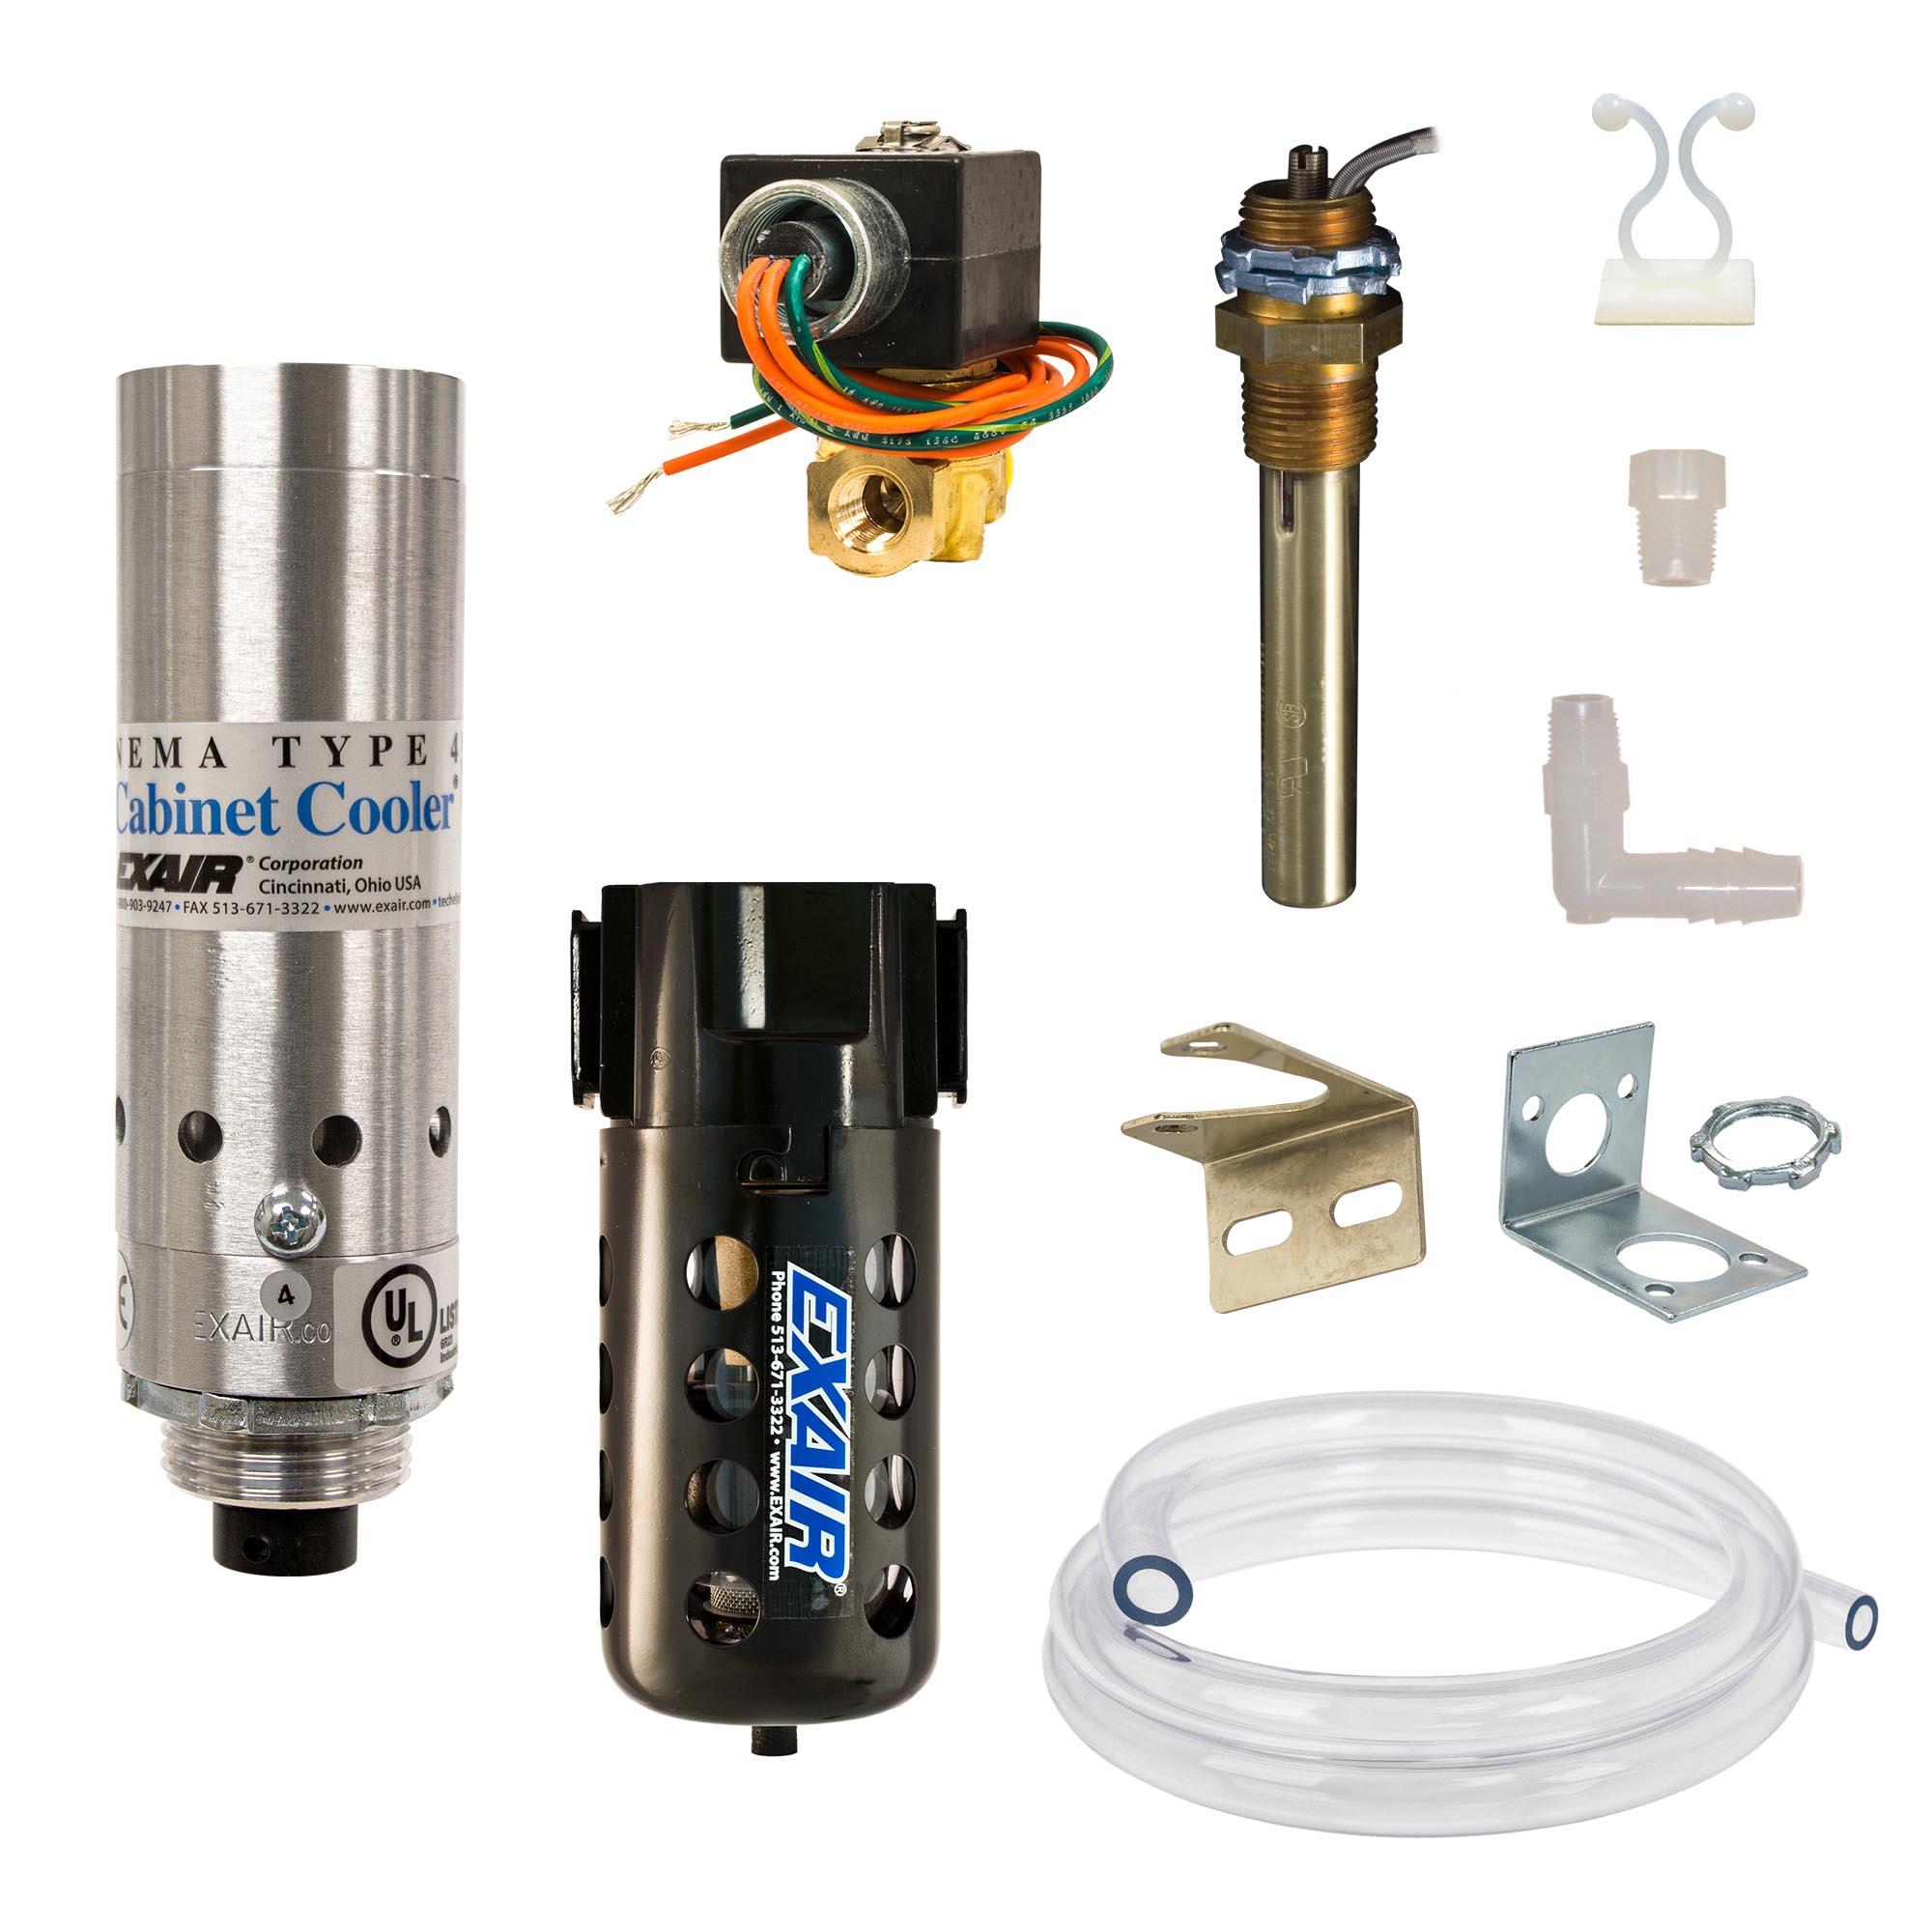 Model W4804 NEMA 4 275 Btu/hr Cabinet Cooler System with Thermostat Control